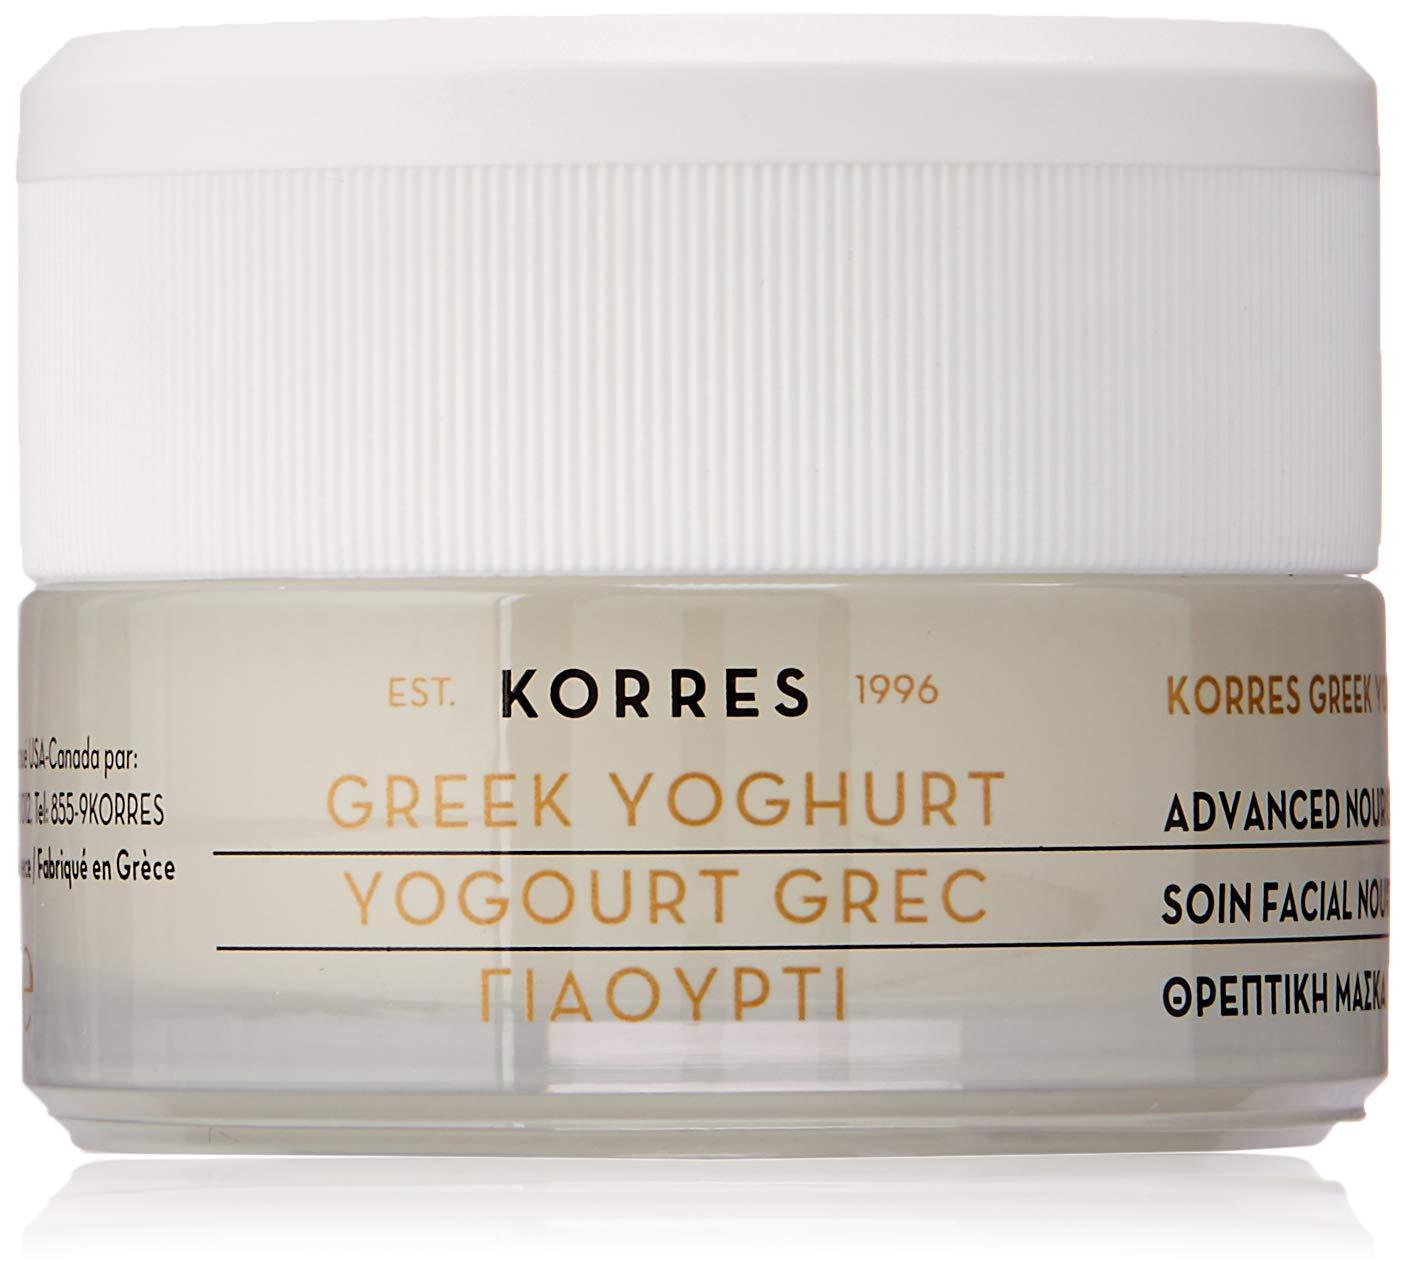 Korres Greek Yoghurt Sleeping Facial, 1 fl. oz.